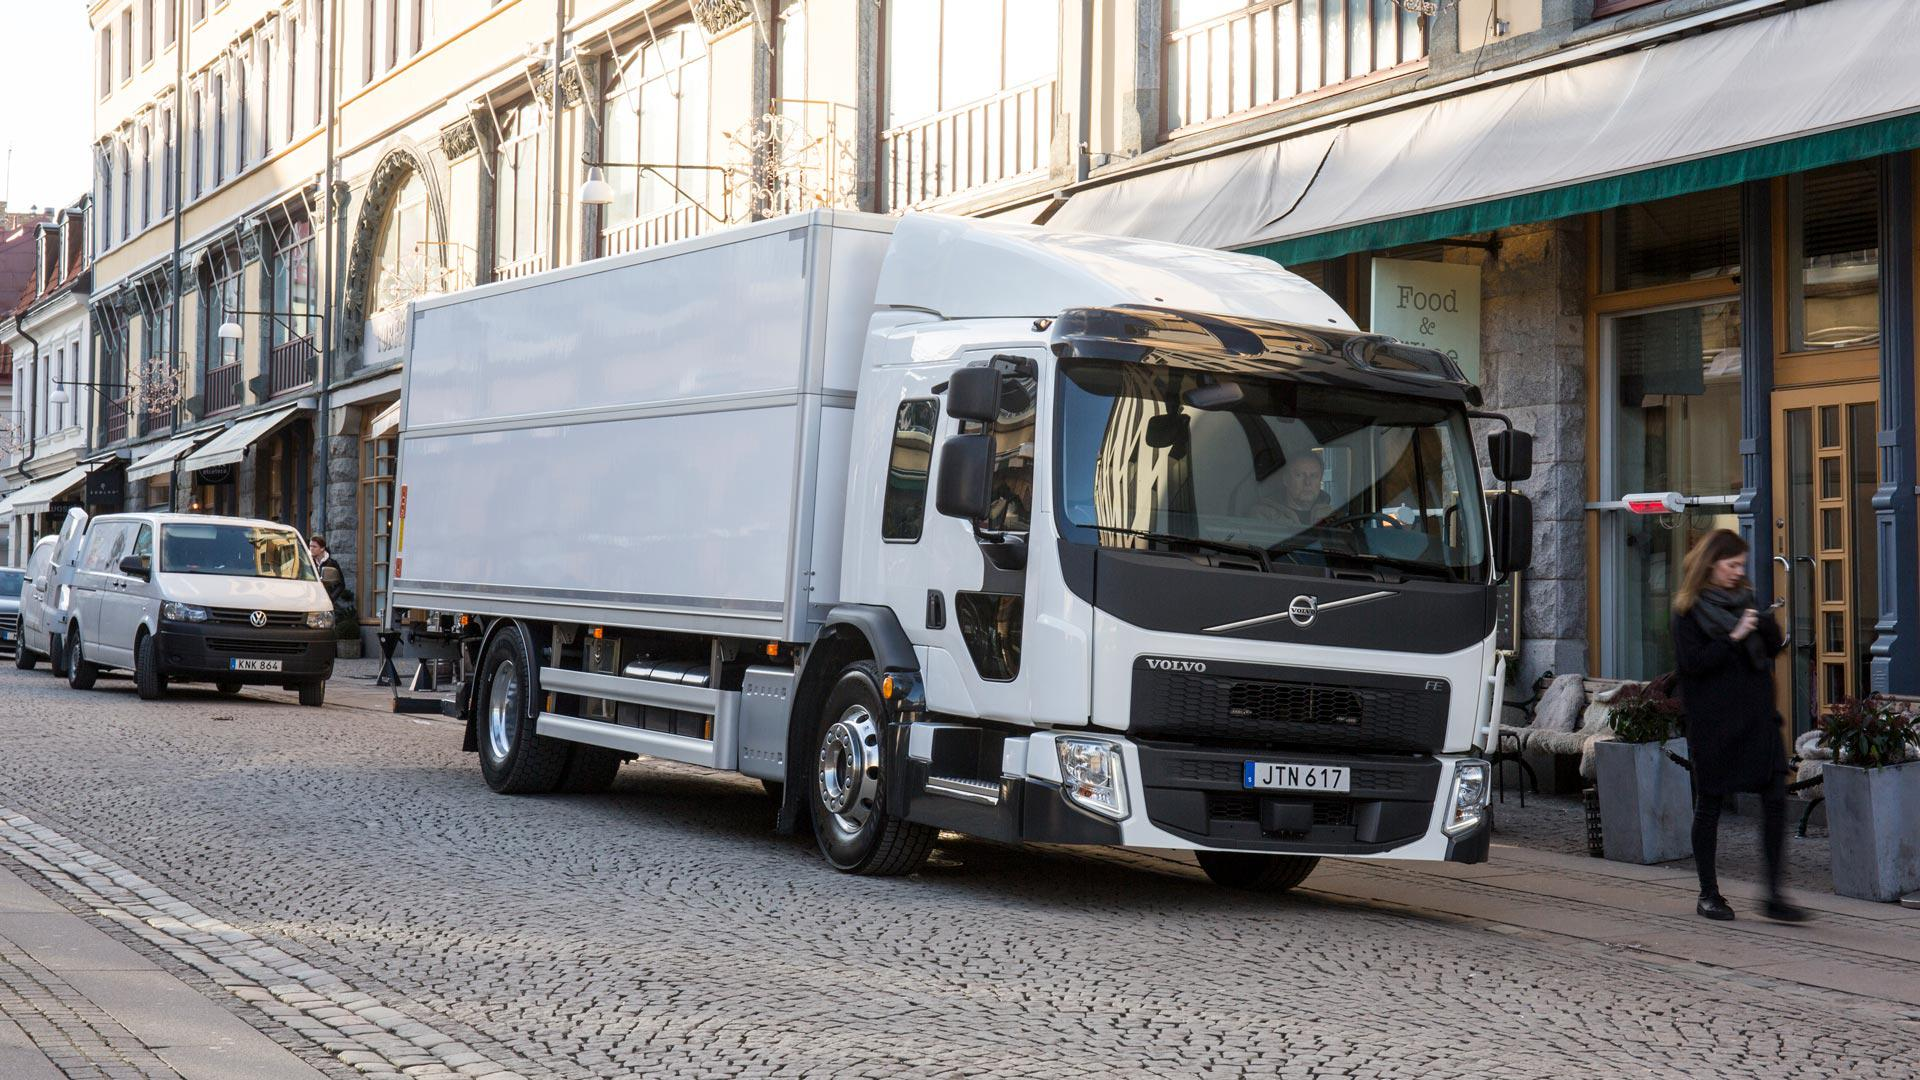 Volvo Trucks Berlin | Renault Trucks Berlin, Buerknersfelder Strasse 15 in Berlin